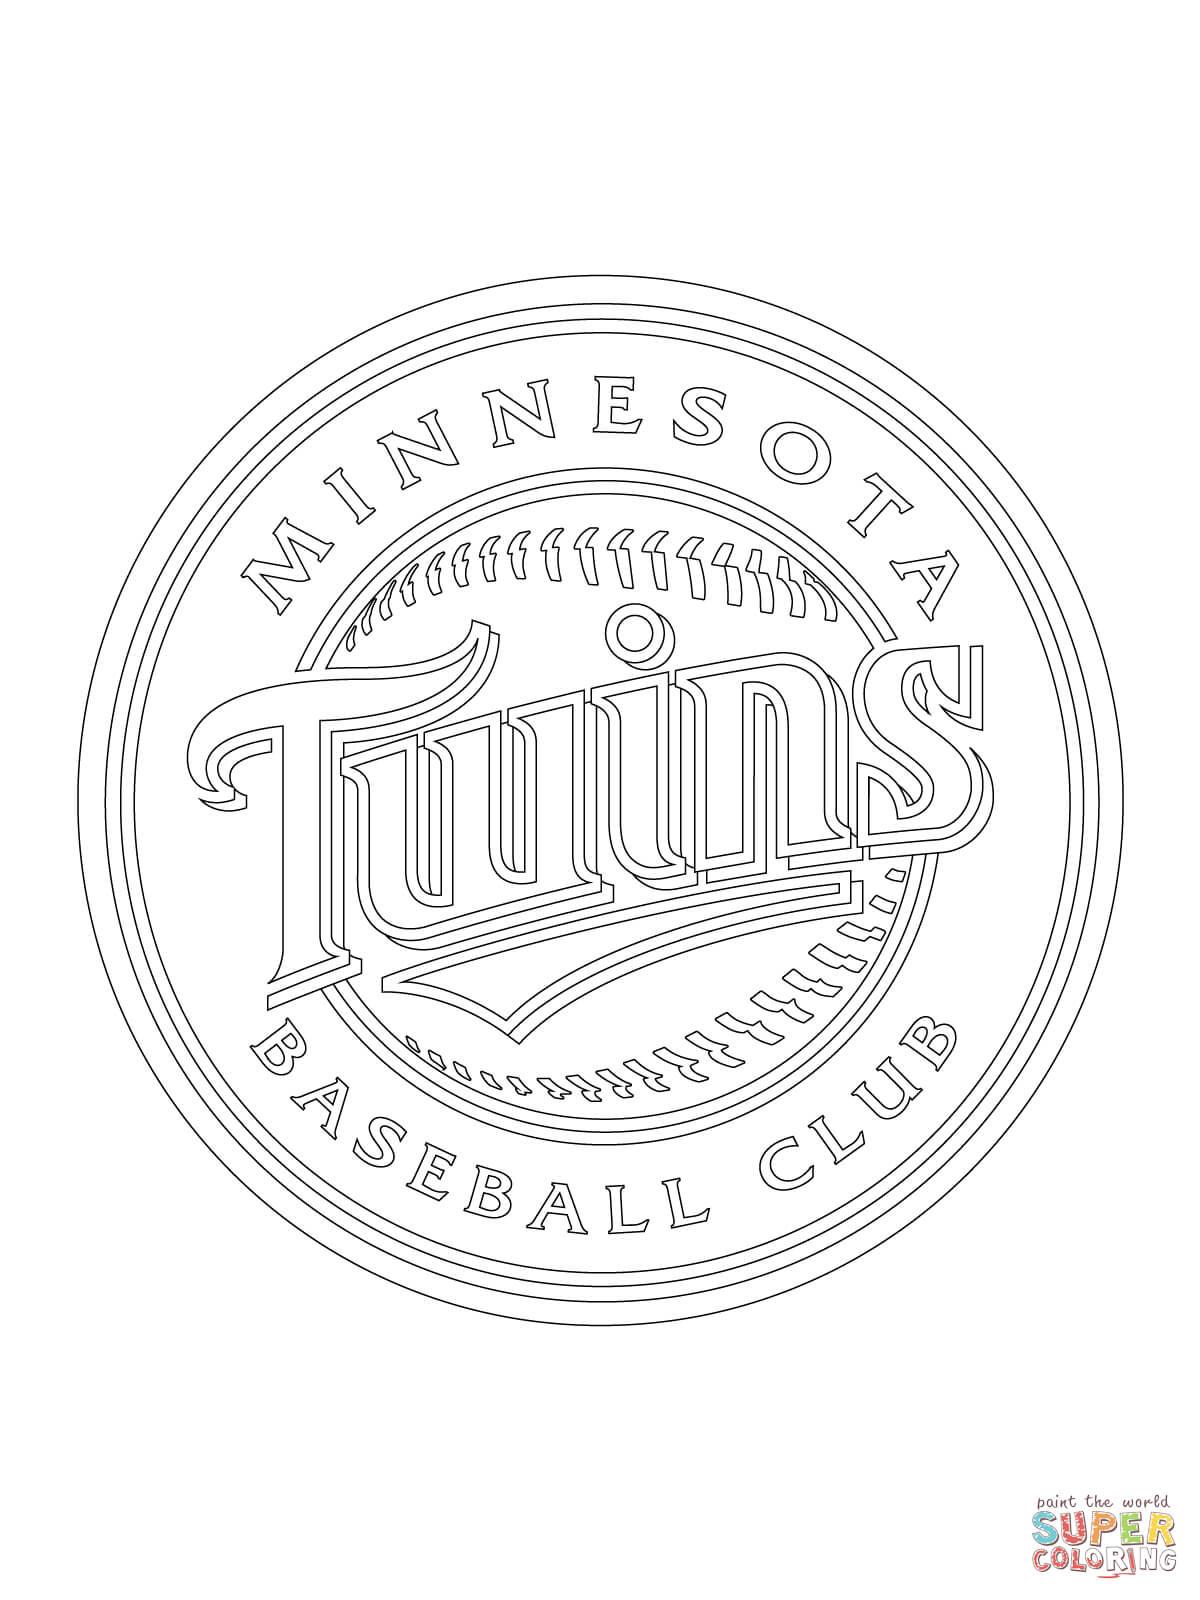 Minnesota Twins Logo Coloring Page